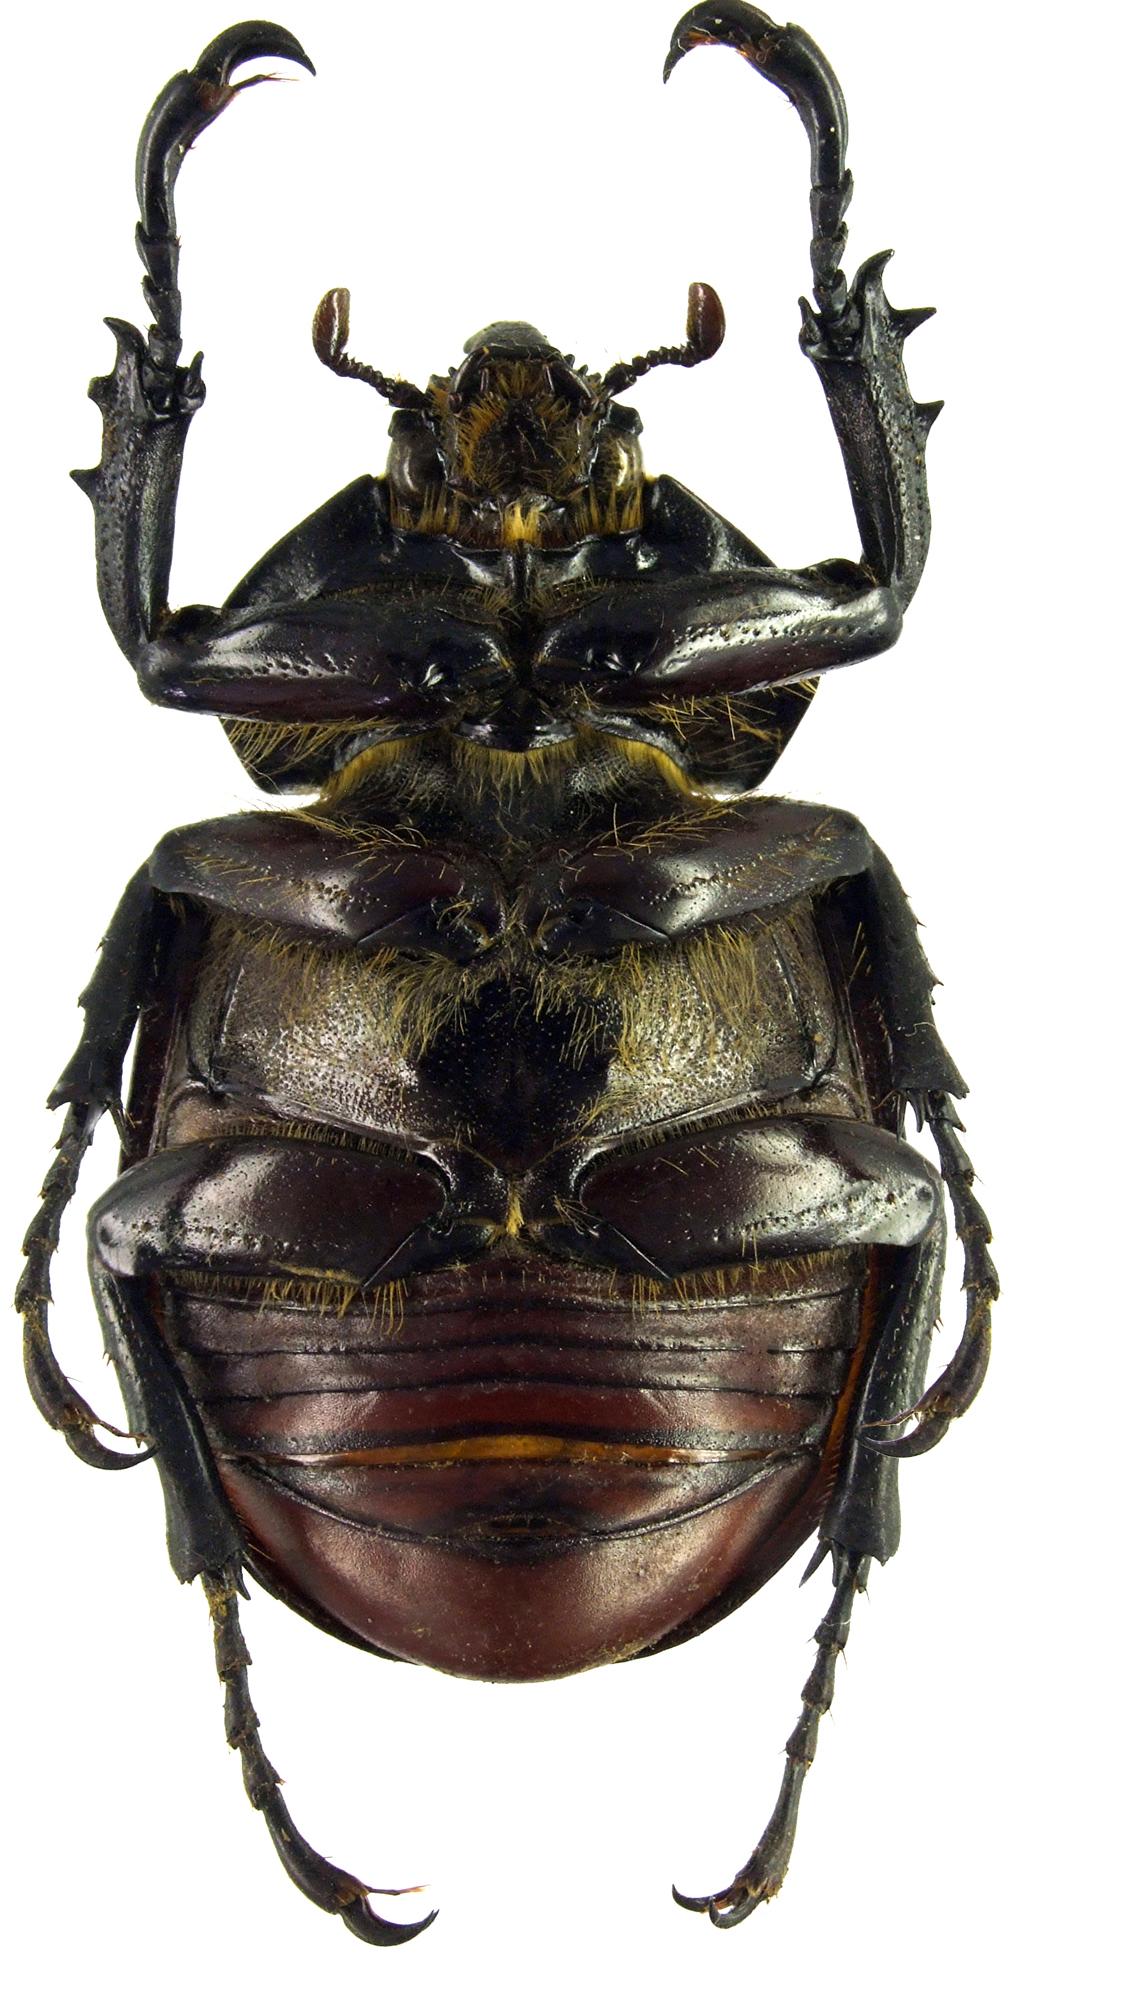 Mitracephala humboldti 81391cz95 .jpg